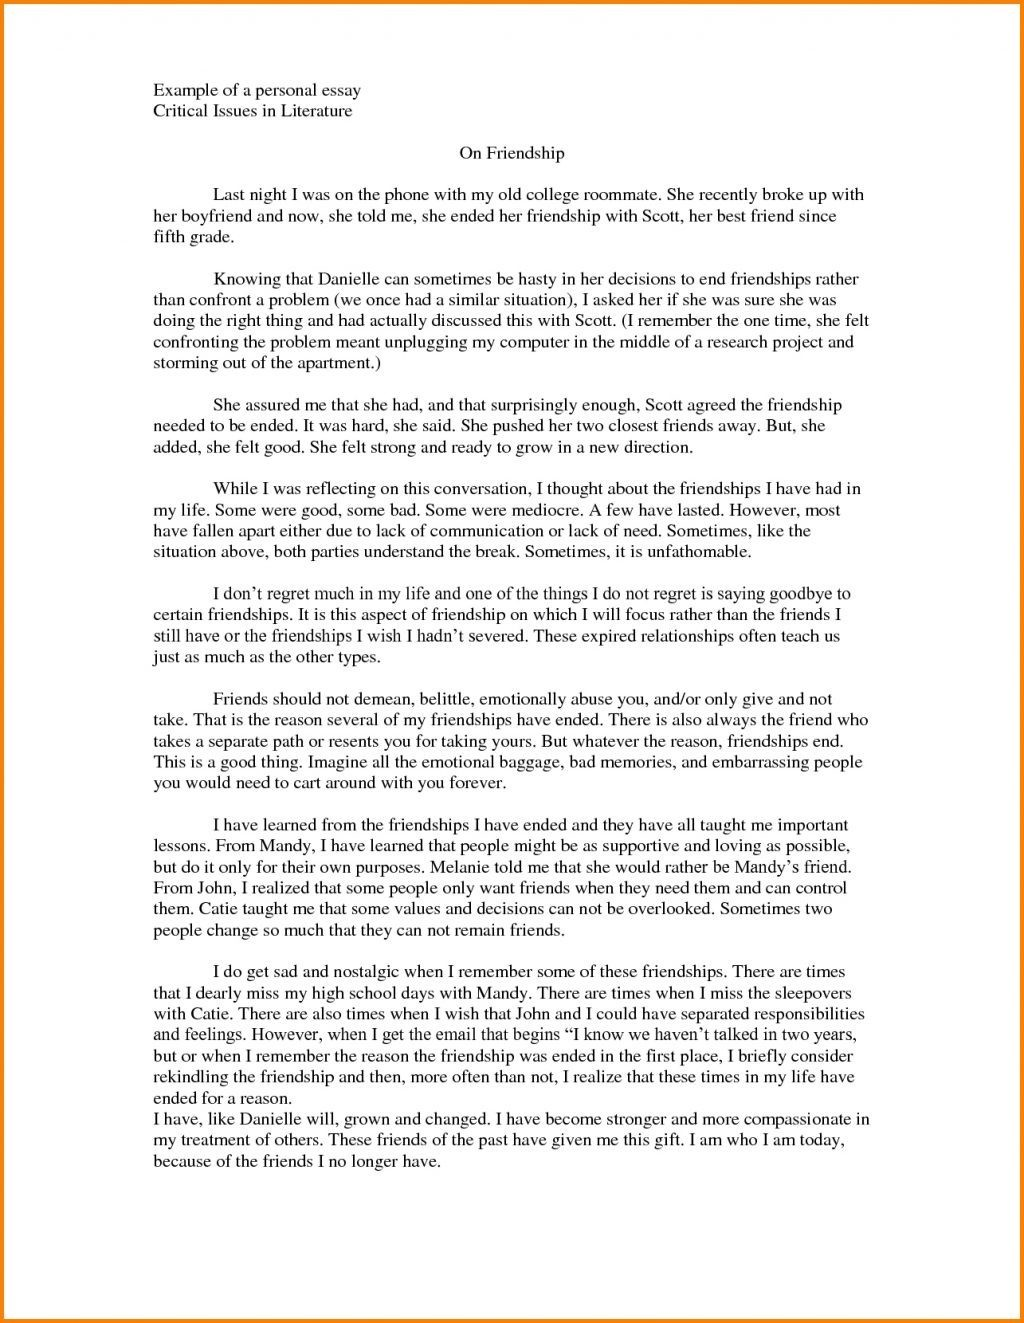 004 Essay Template Personal Narratives High School Conversation Topics Imposing Large